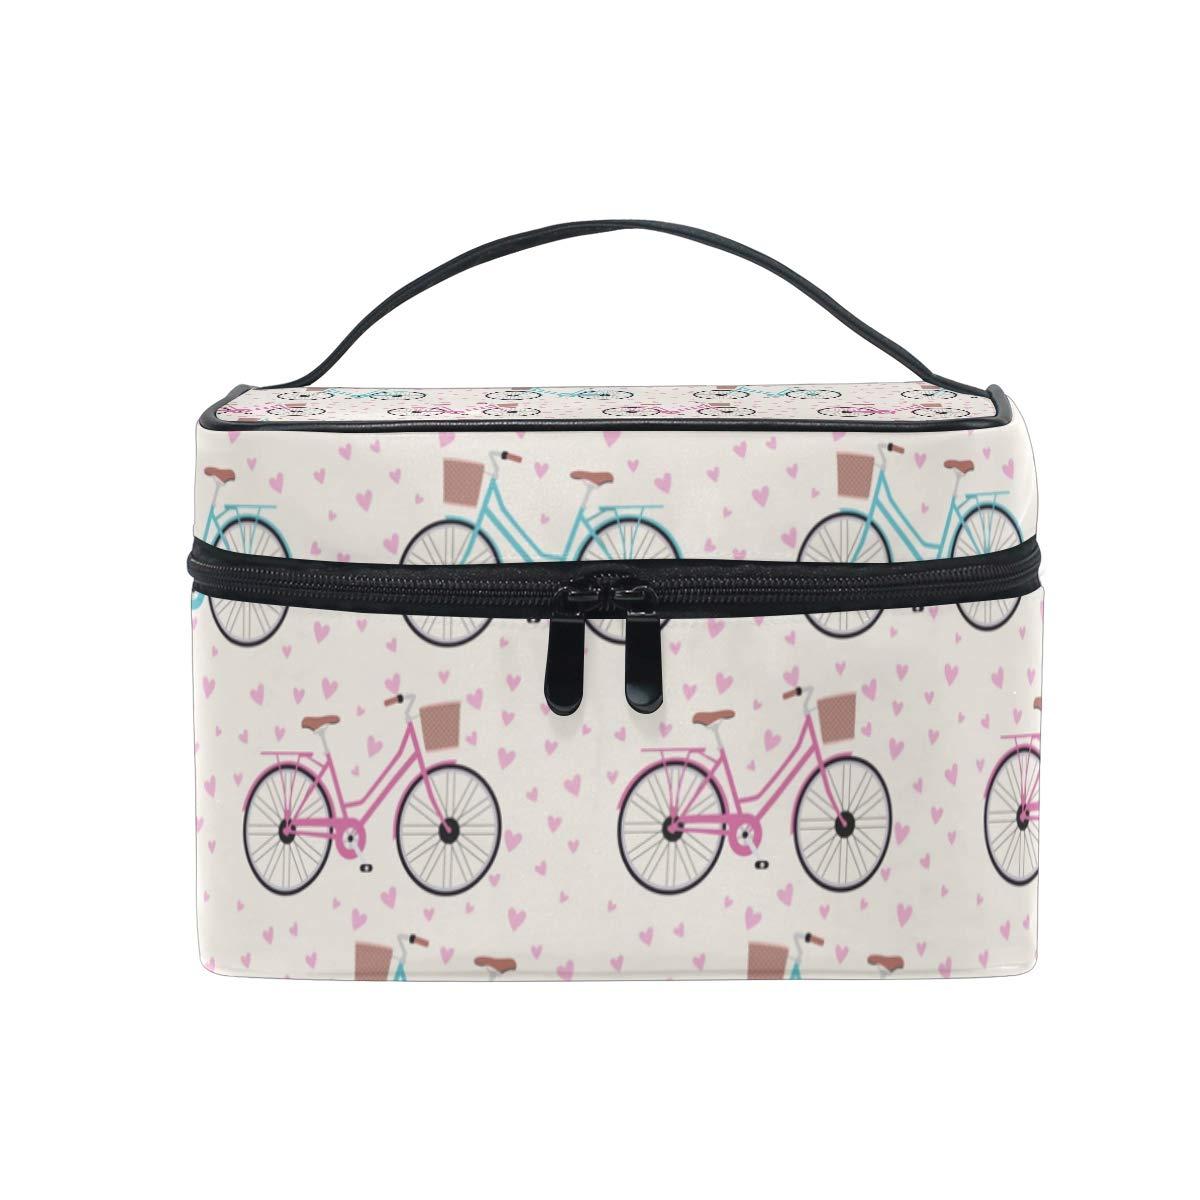 Large Travel Makeup Train Case Cute Heart Bicycle Romantic Carrying Portable Zip Cosmetic Brush Bag Makeup Bag Organizer for Girls Women